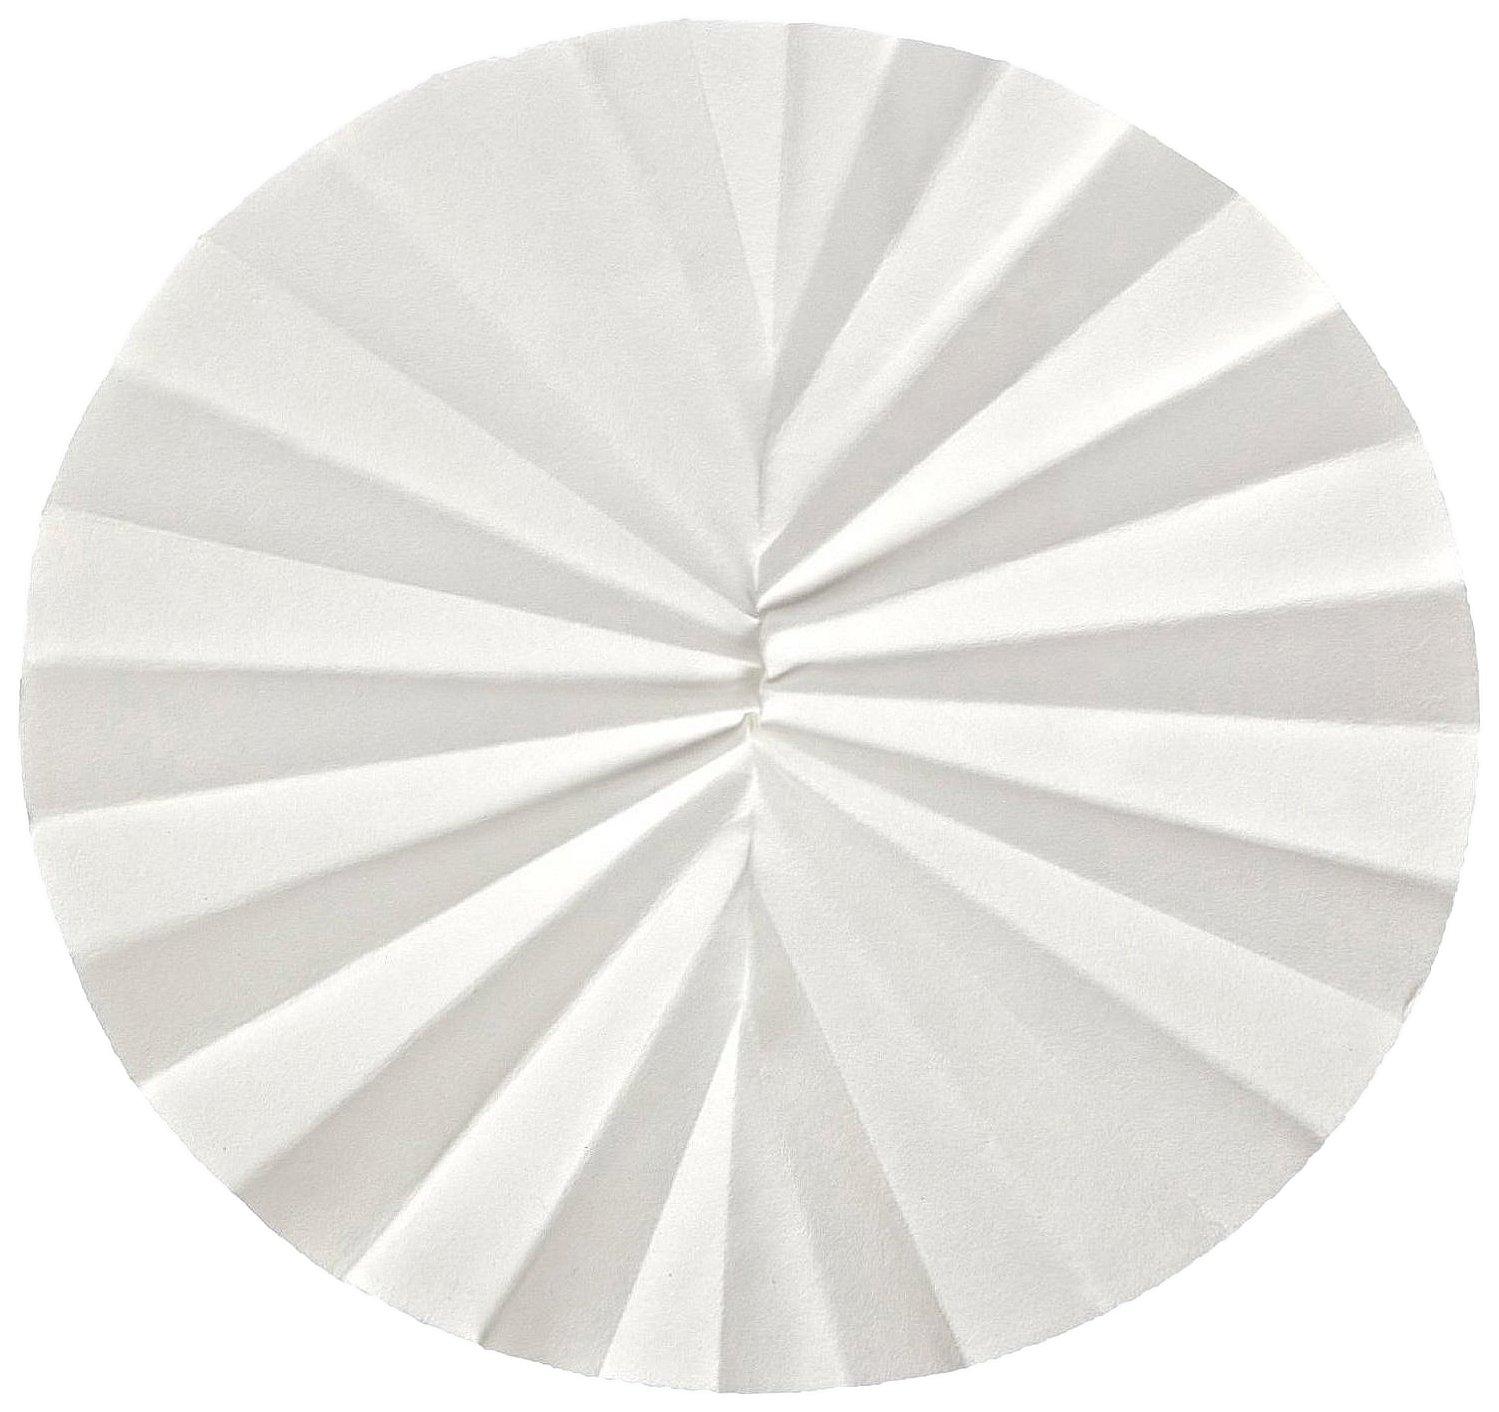 Pack of 50 Grade 617 20.5cm Diameter Fast Flow Ahlstrom 6170-2050 Qualitative Filter Paper 35 Micron